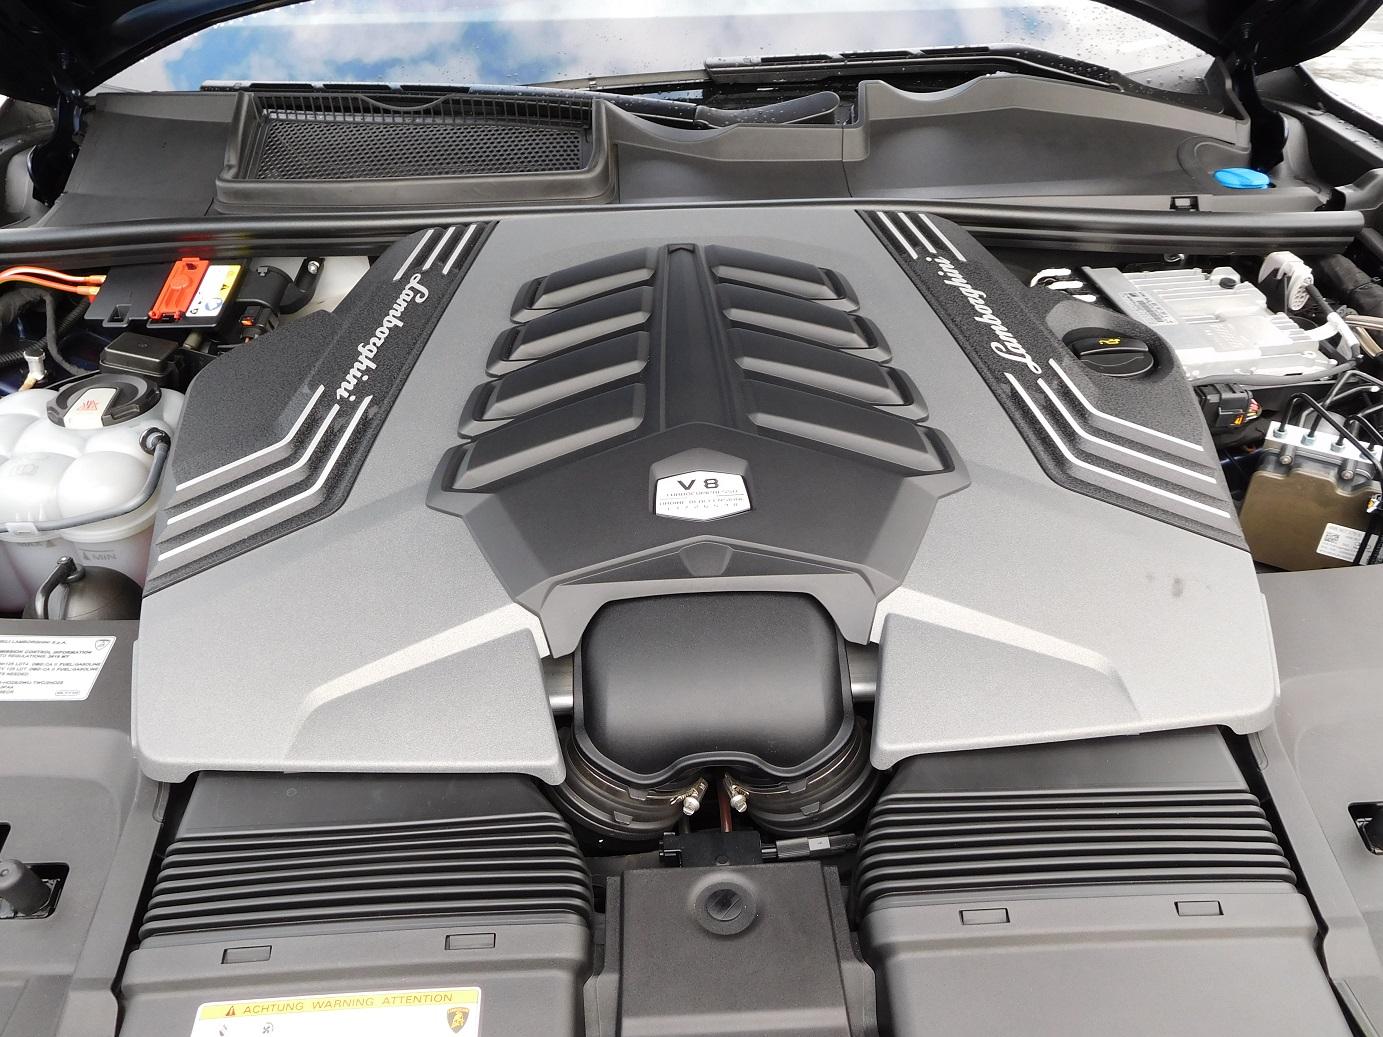 The twin-turbocharged, 650-horsepower V-8